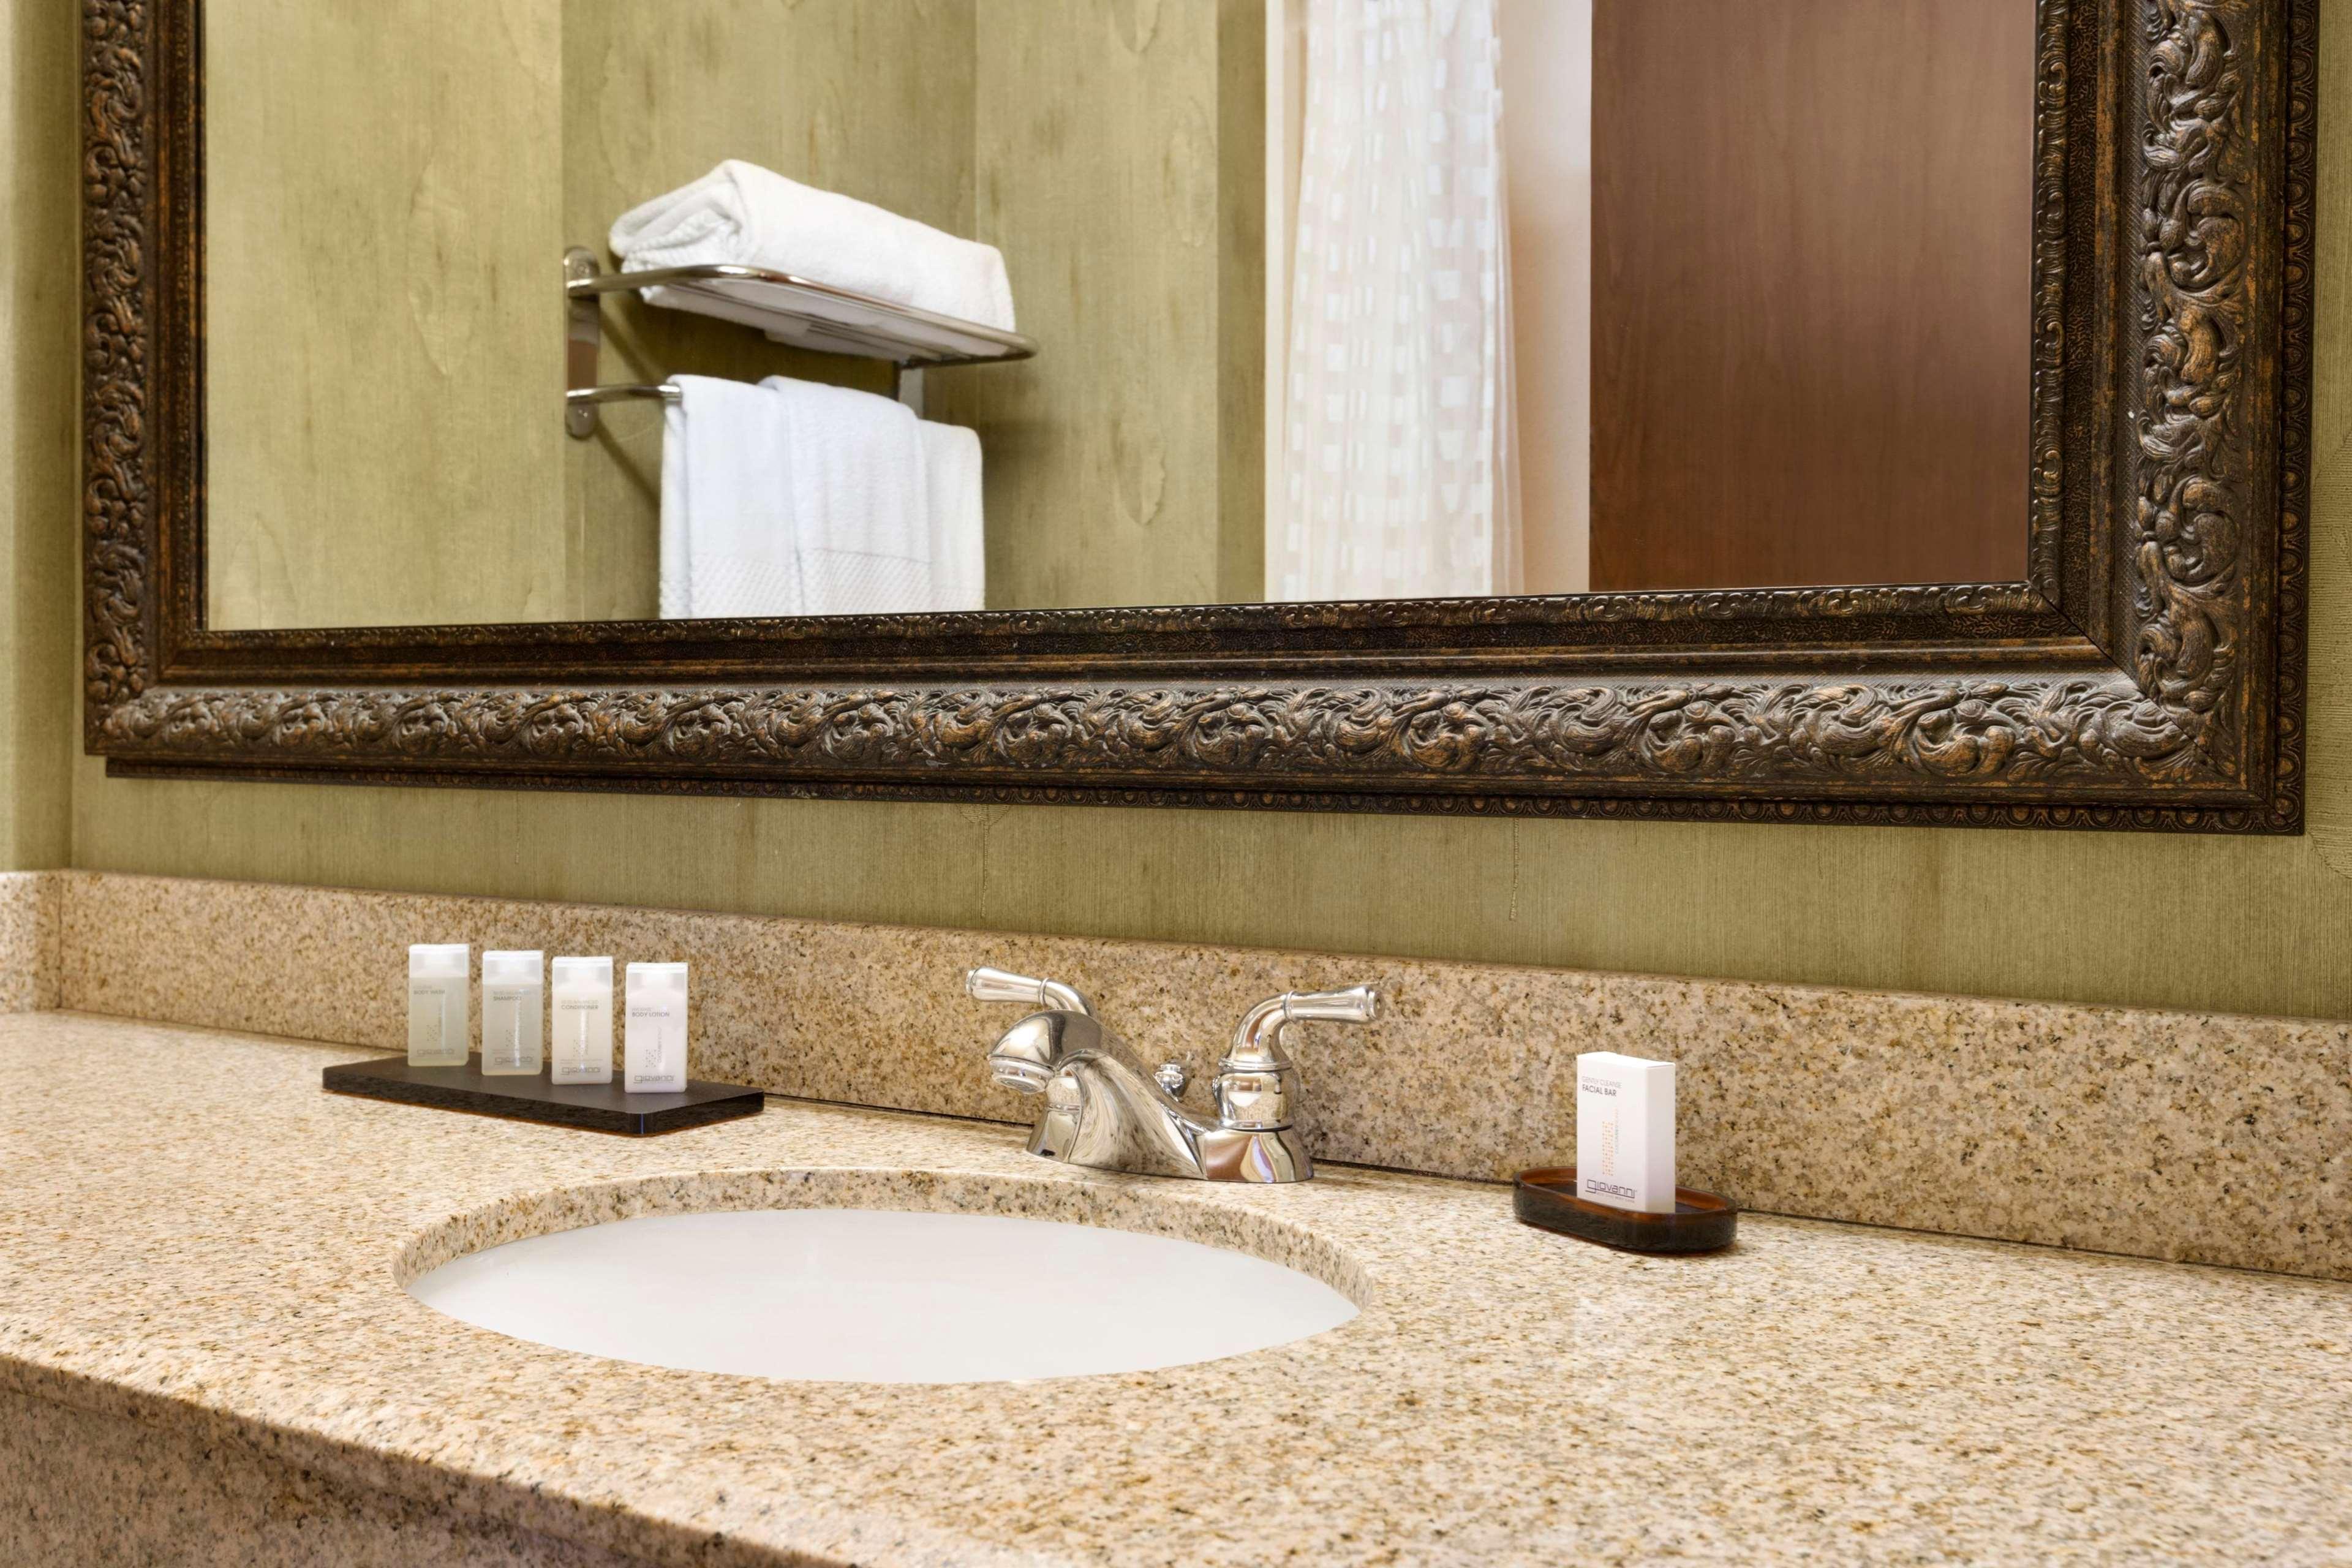 Embassy Suites by Hilton Albuquerque Hotel & Spa image 37